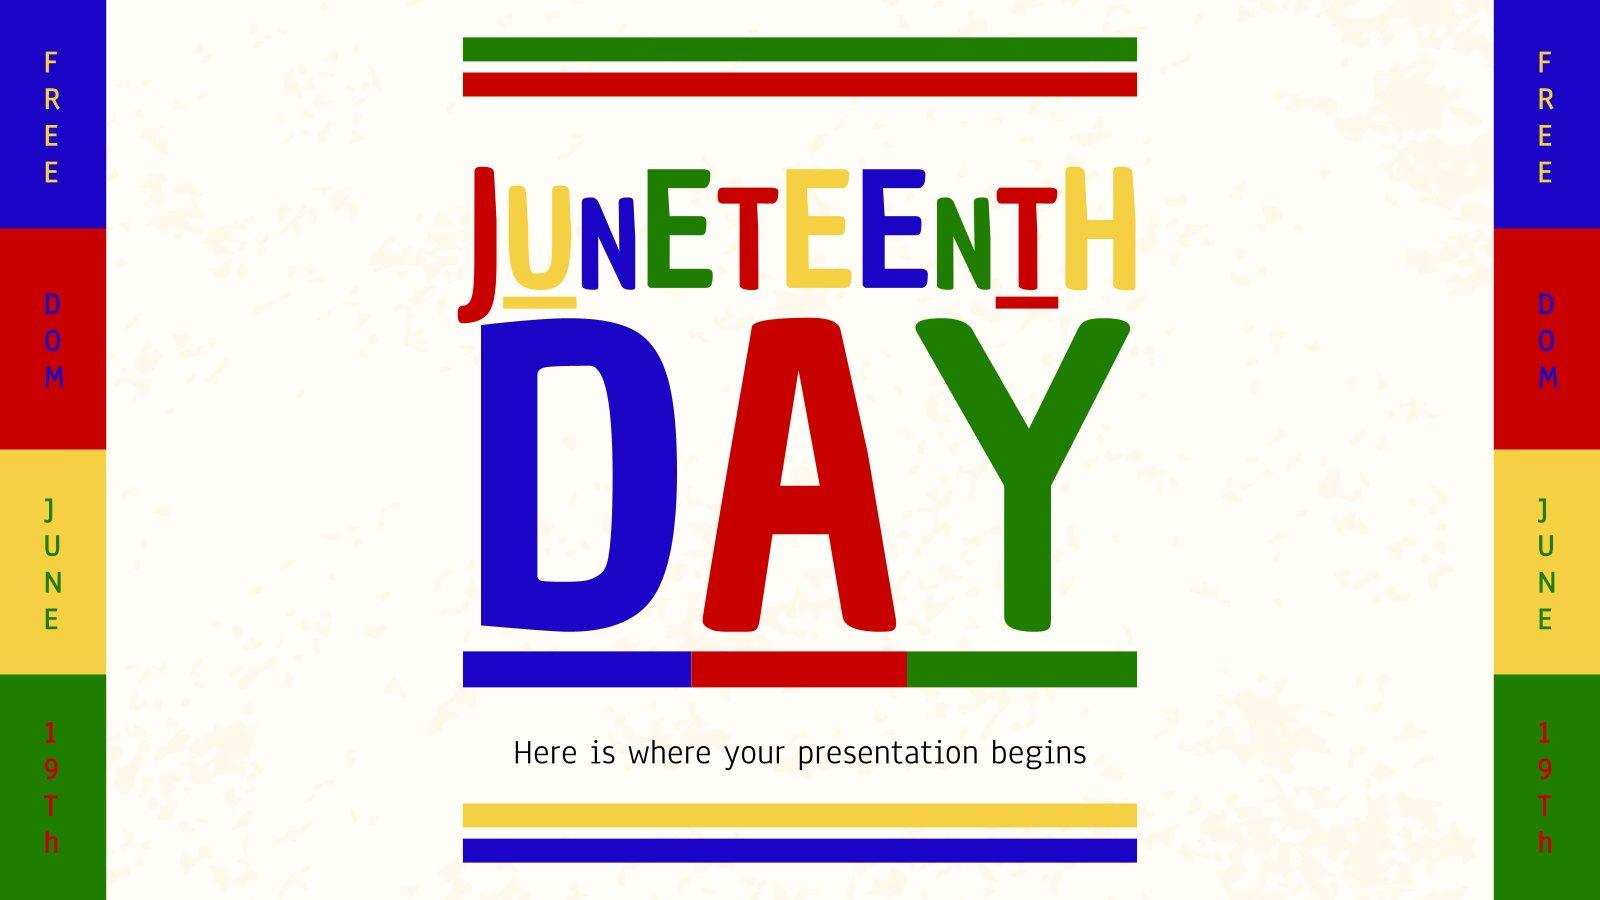 Juneteenth Day presentation template